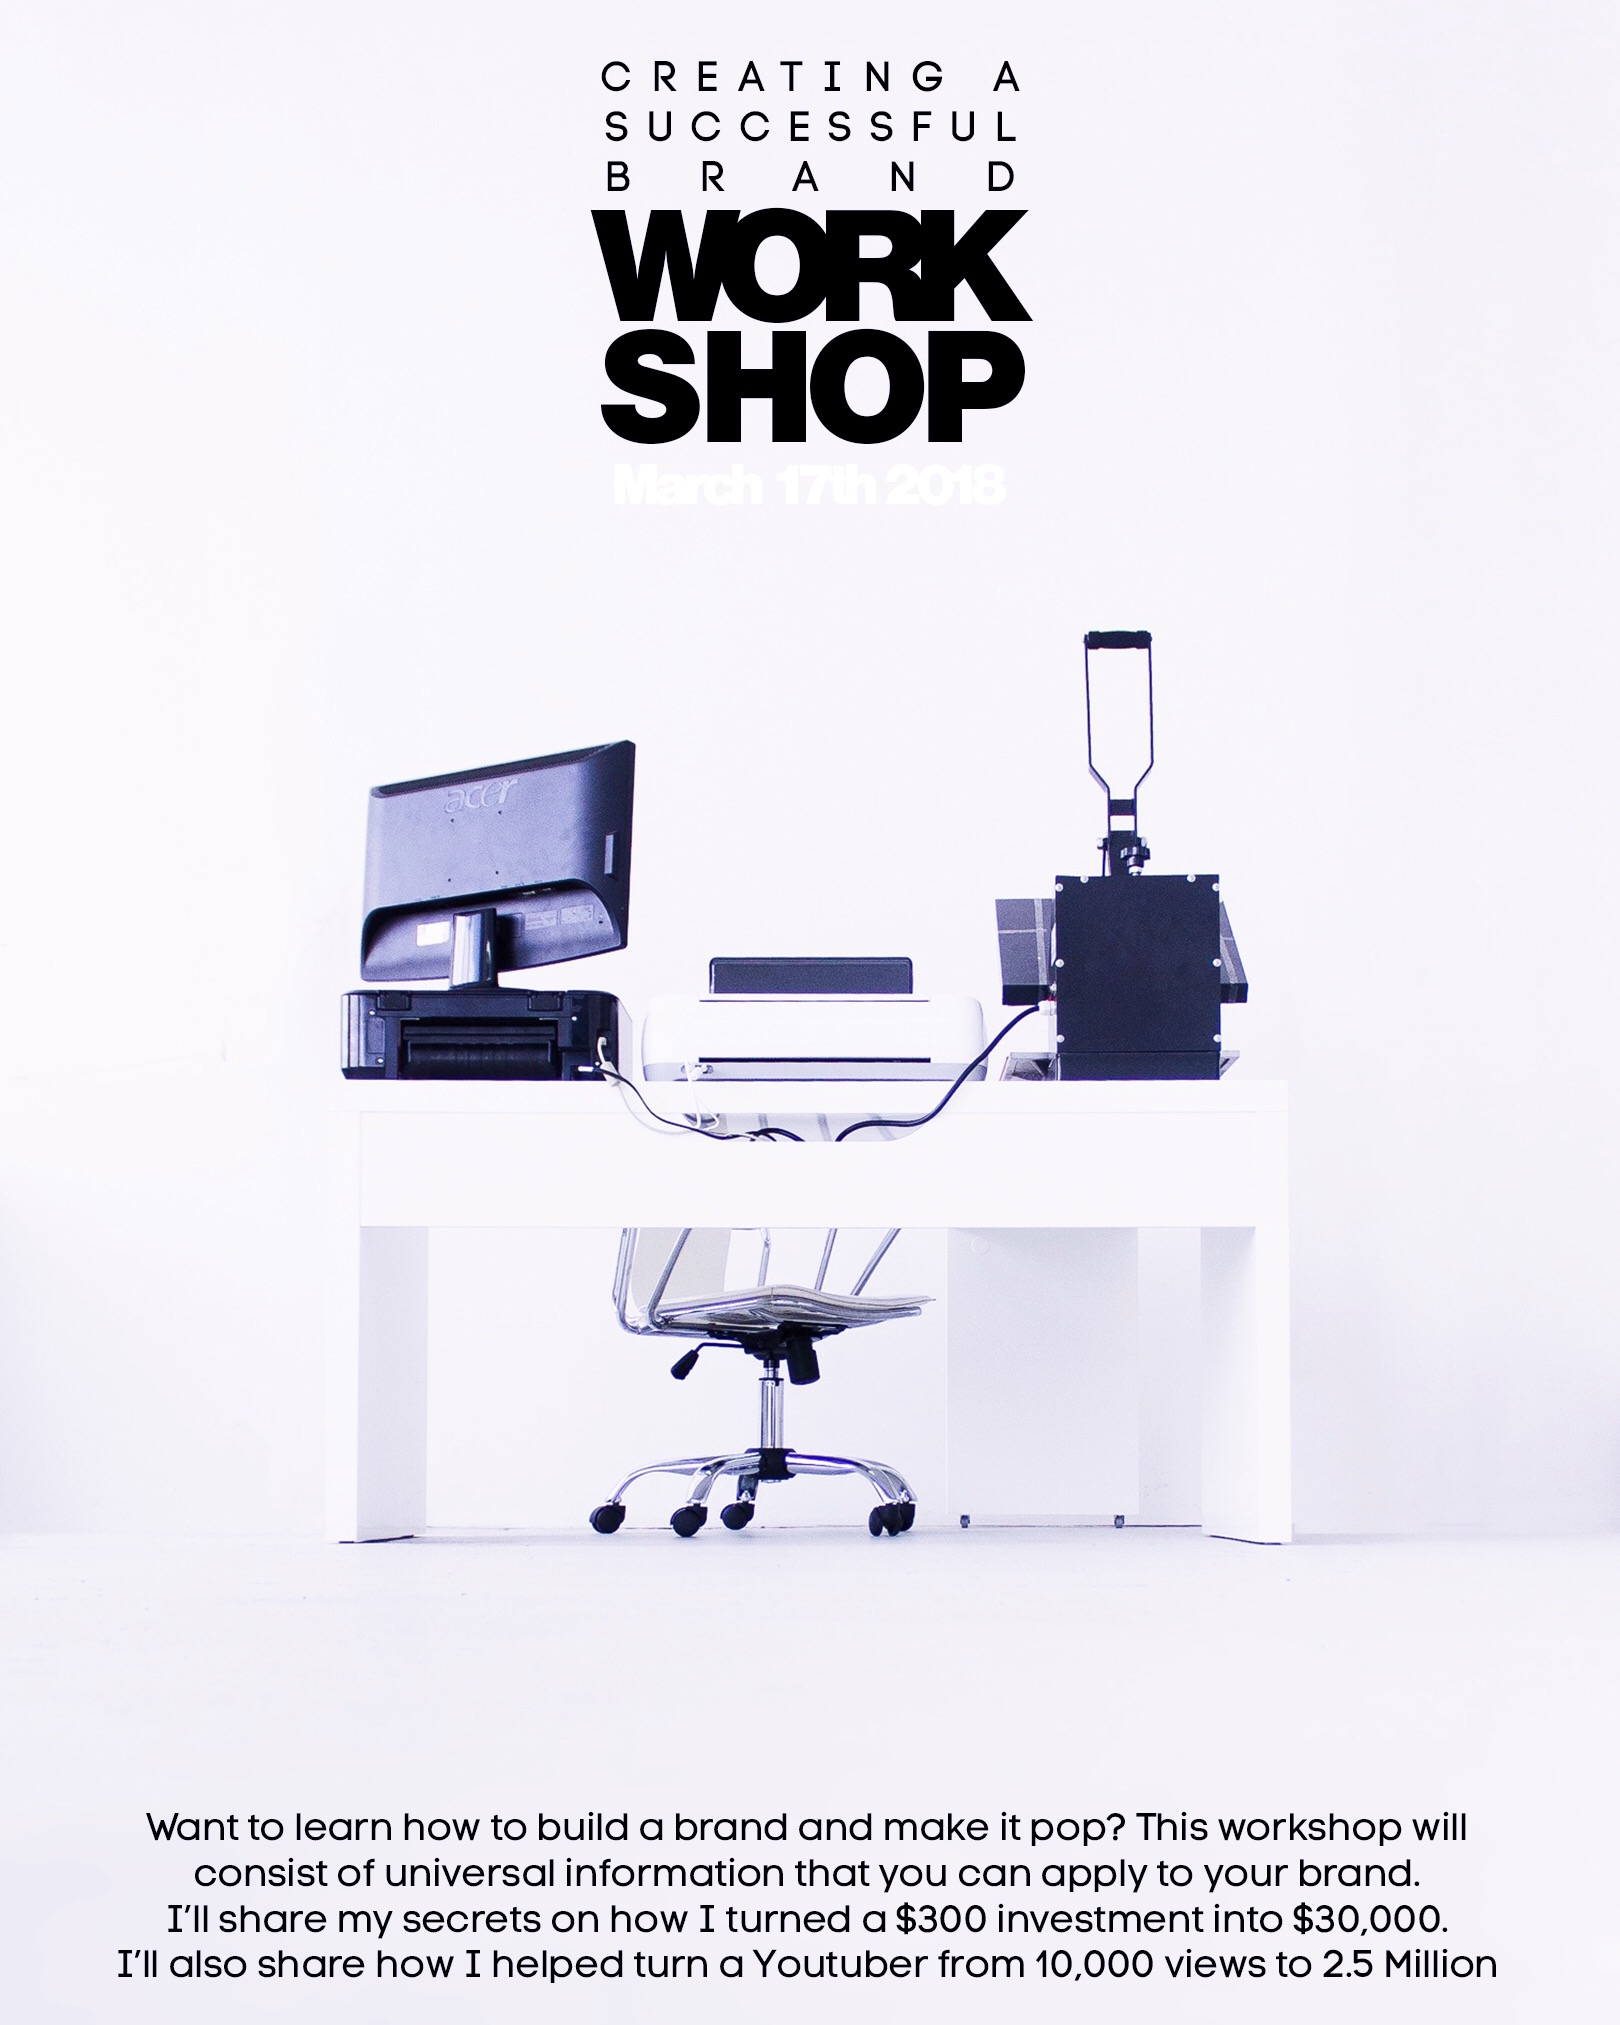 Unity Design Workshop - March 17th – Create A Successful Brand